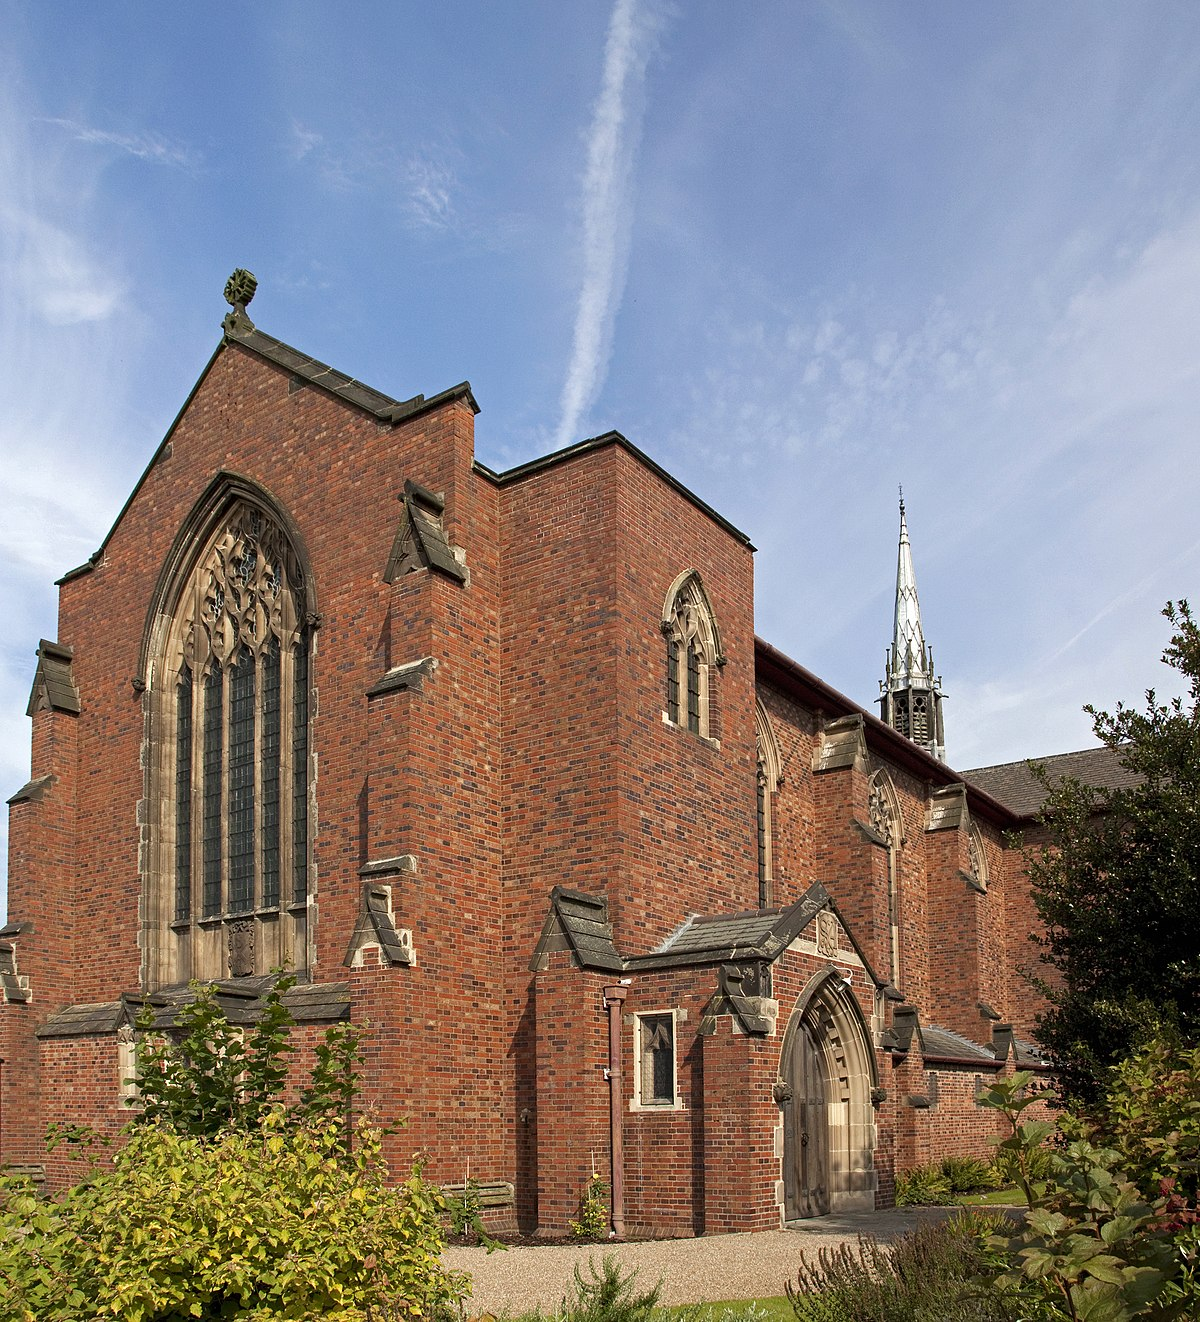 St Andrew's Church, Handsworth